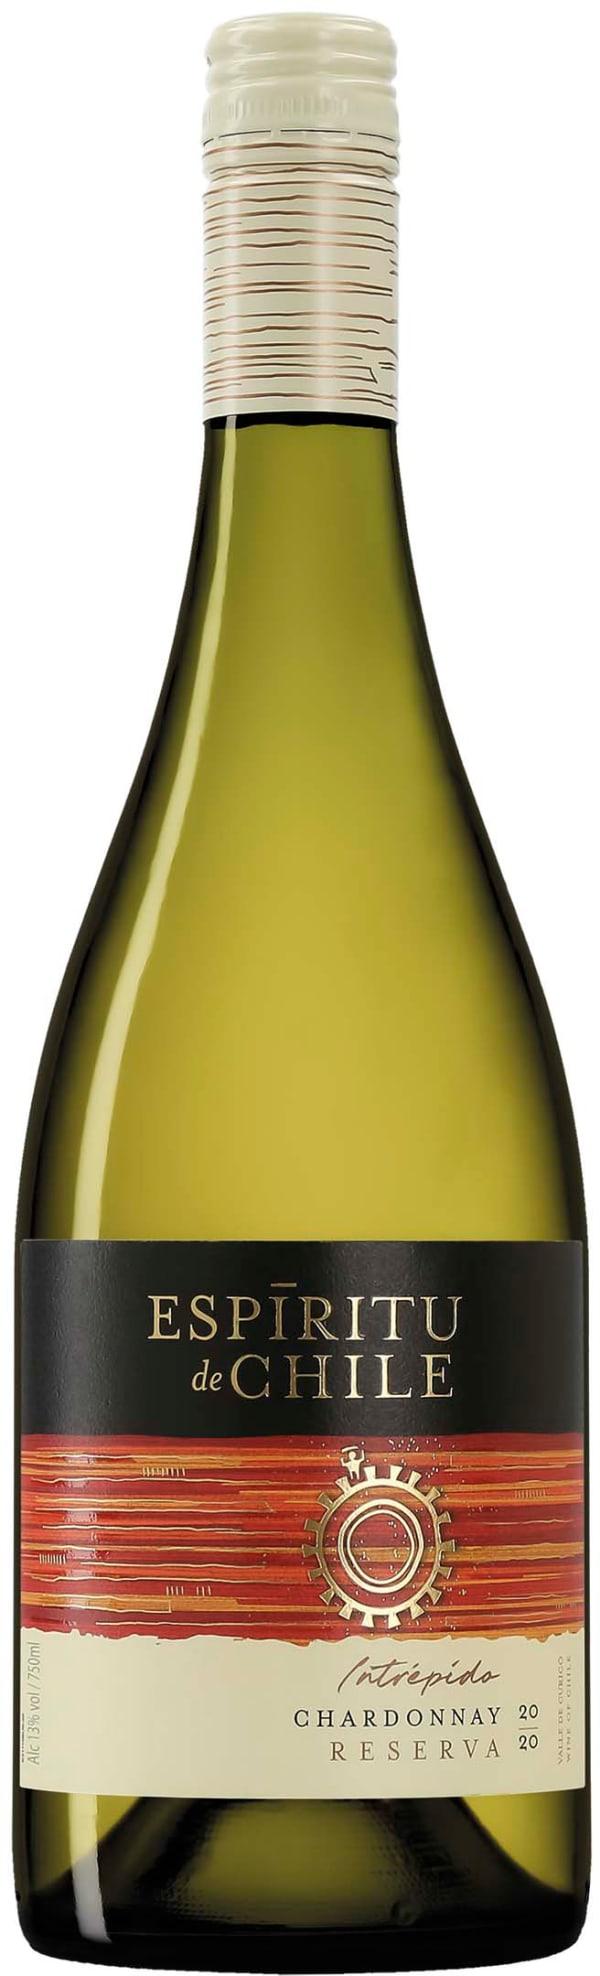 Espíritu de Chile Reserva Chardonnay 2018